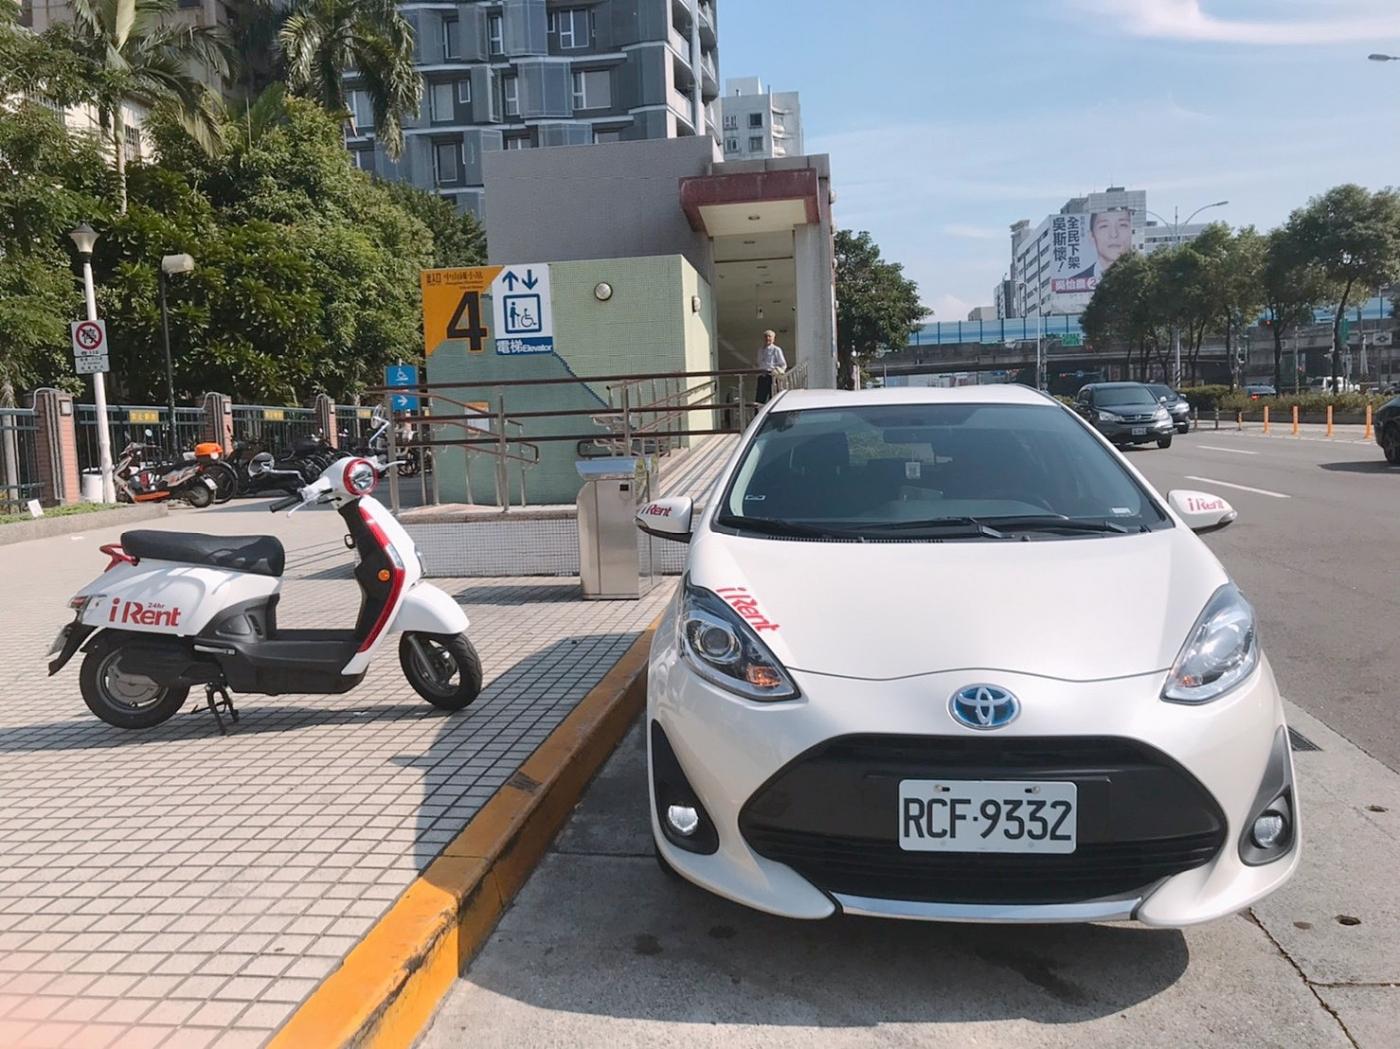 「iRent共享汽機車」推出「iRent好行,多元運具加乘用,優惠加倍送」, 最高送iRent汽車270分鐘、機車時數90分鐘